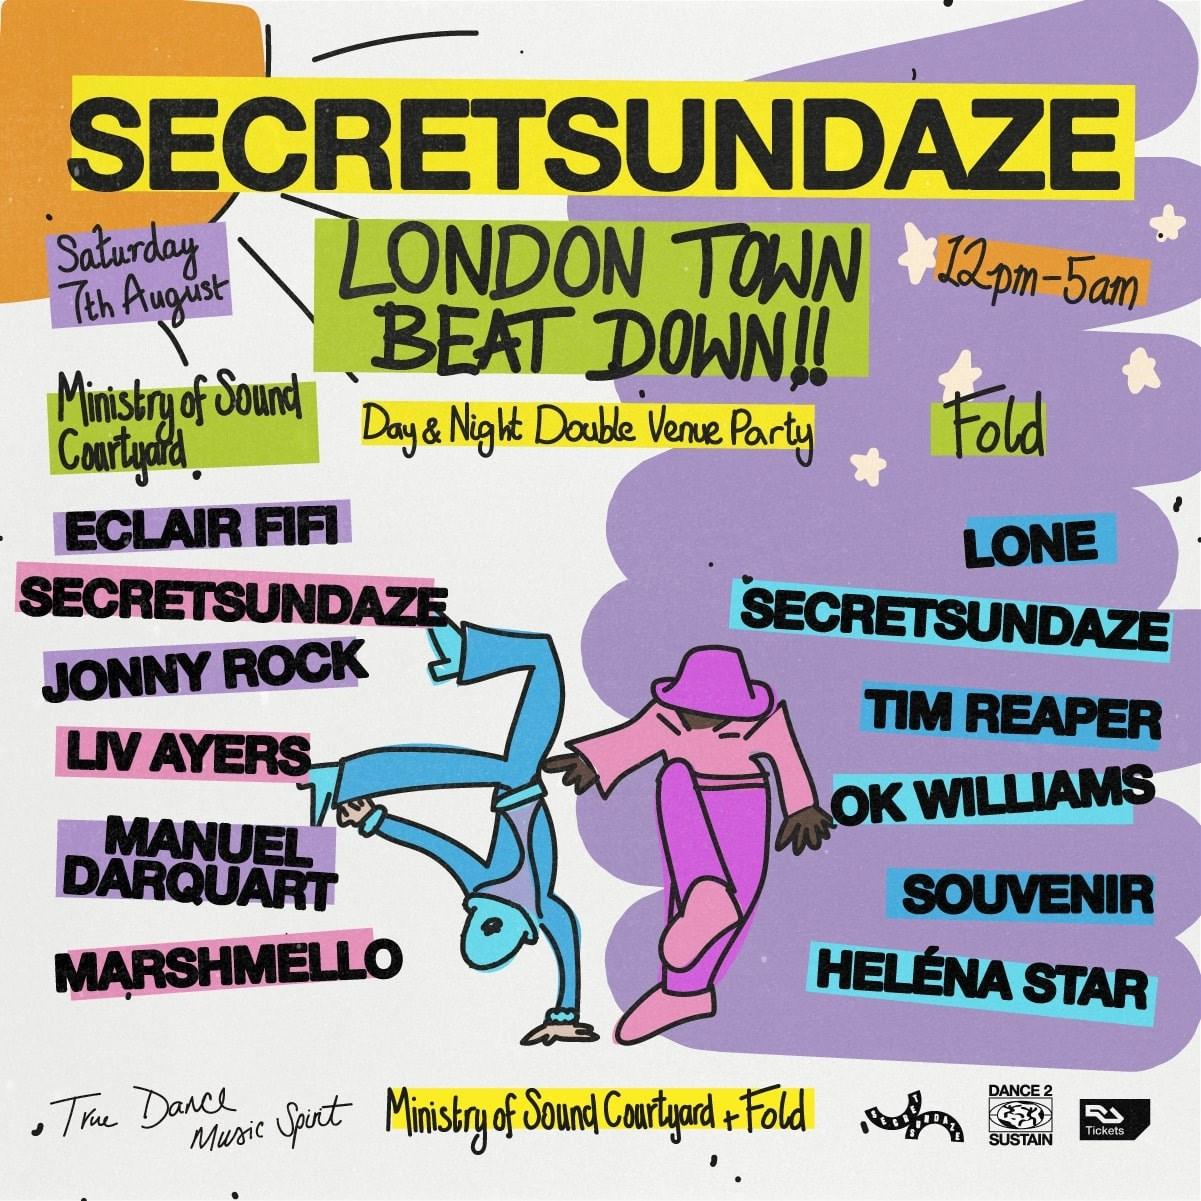 Secretsundaze London Town Beat Down!! Double Venue Day & / or Night Party - Flyer back